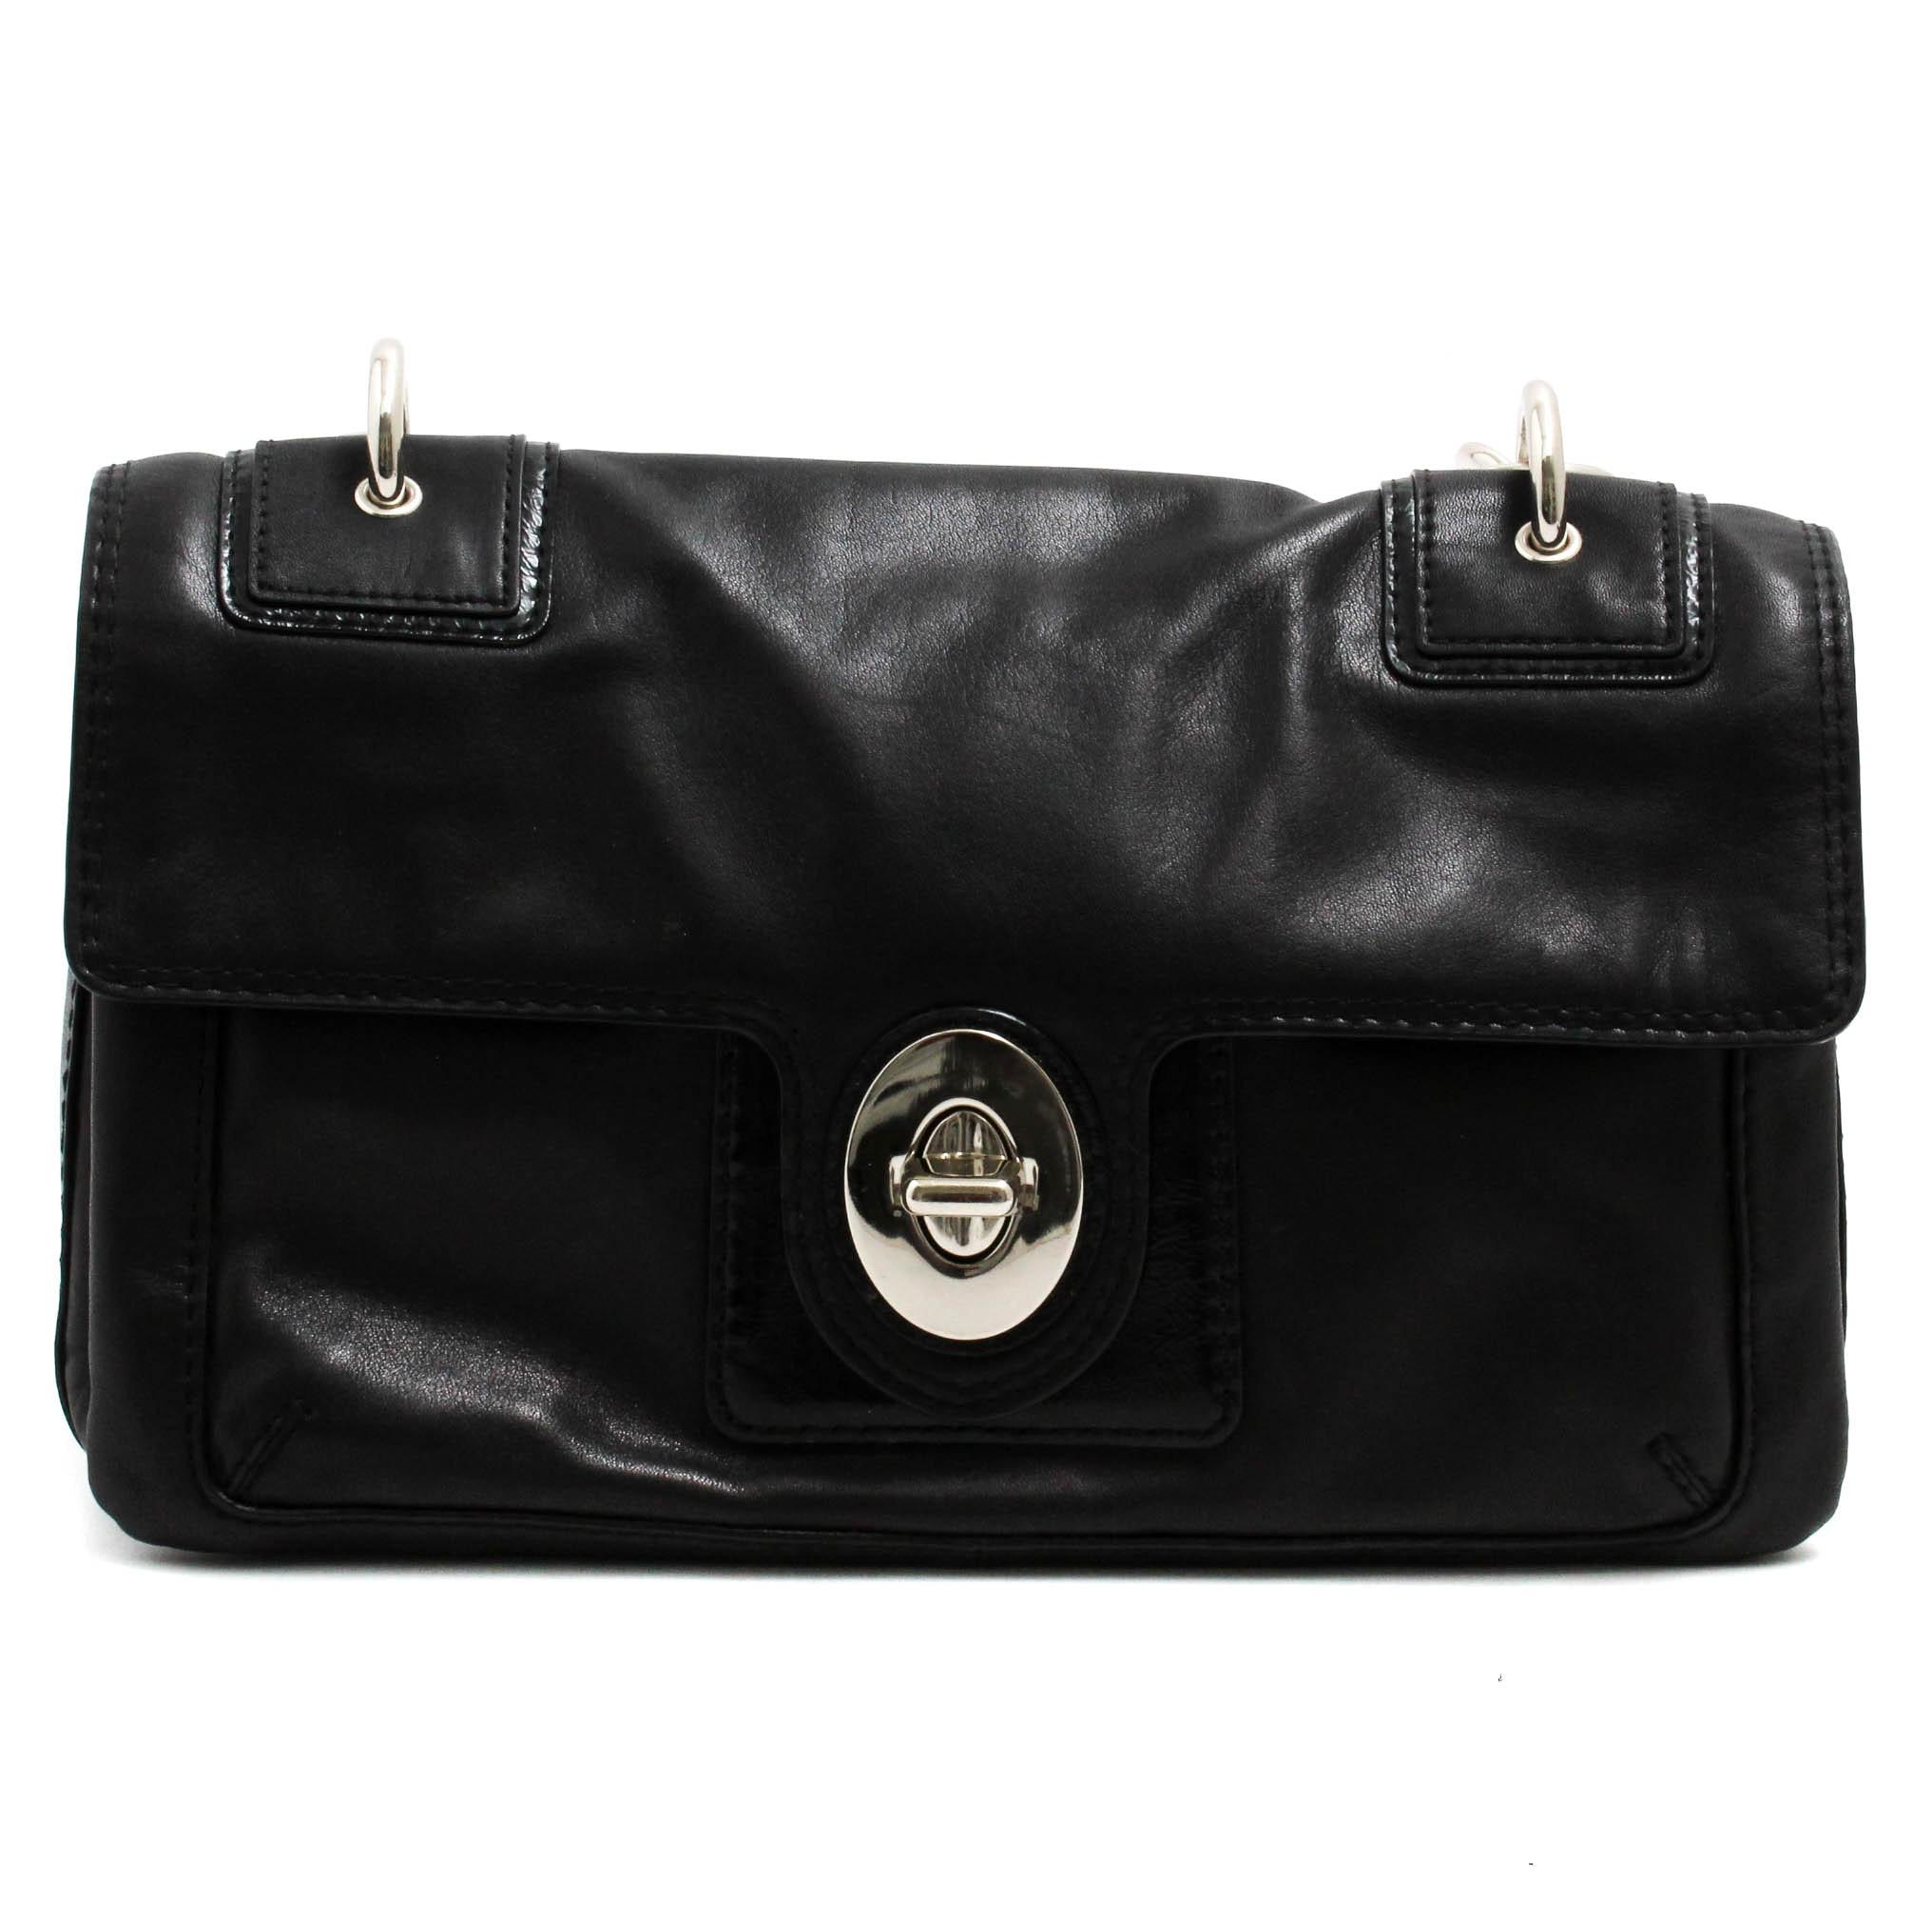 Coach Peyton Black Leather Flap Shoulder Bag